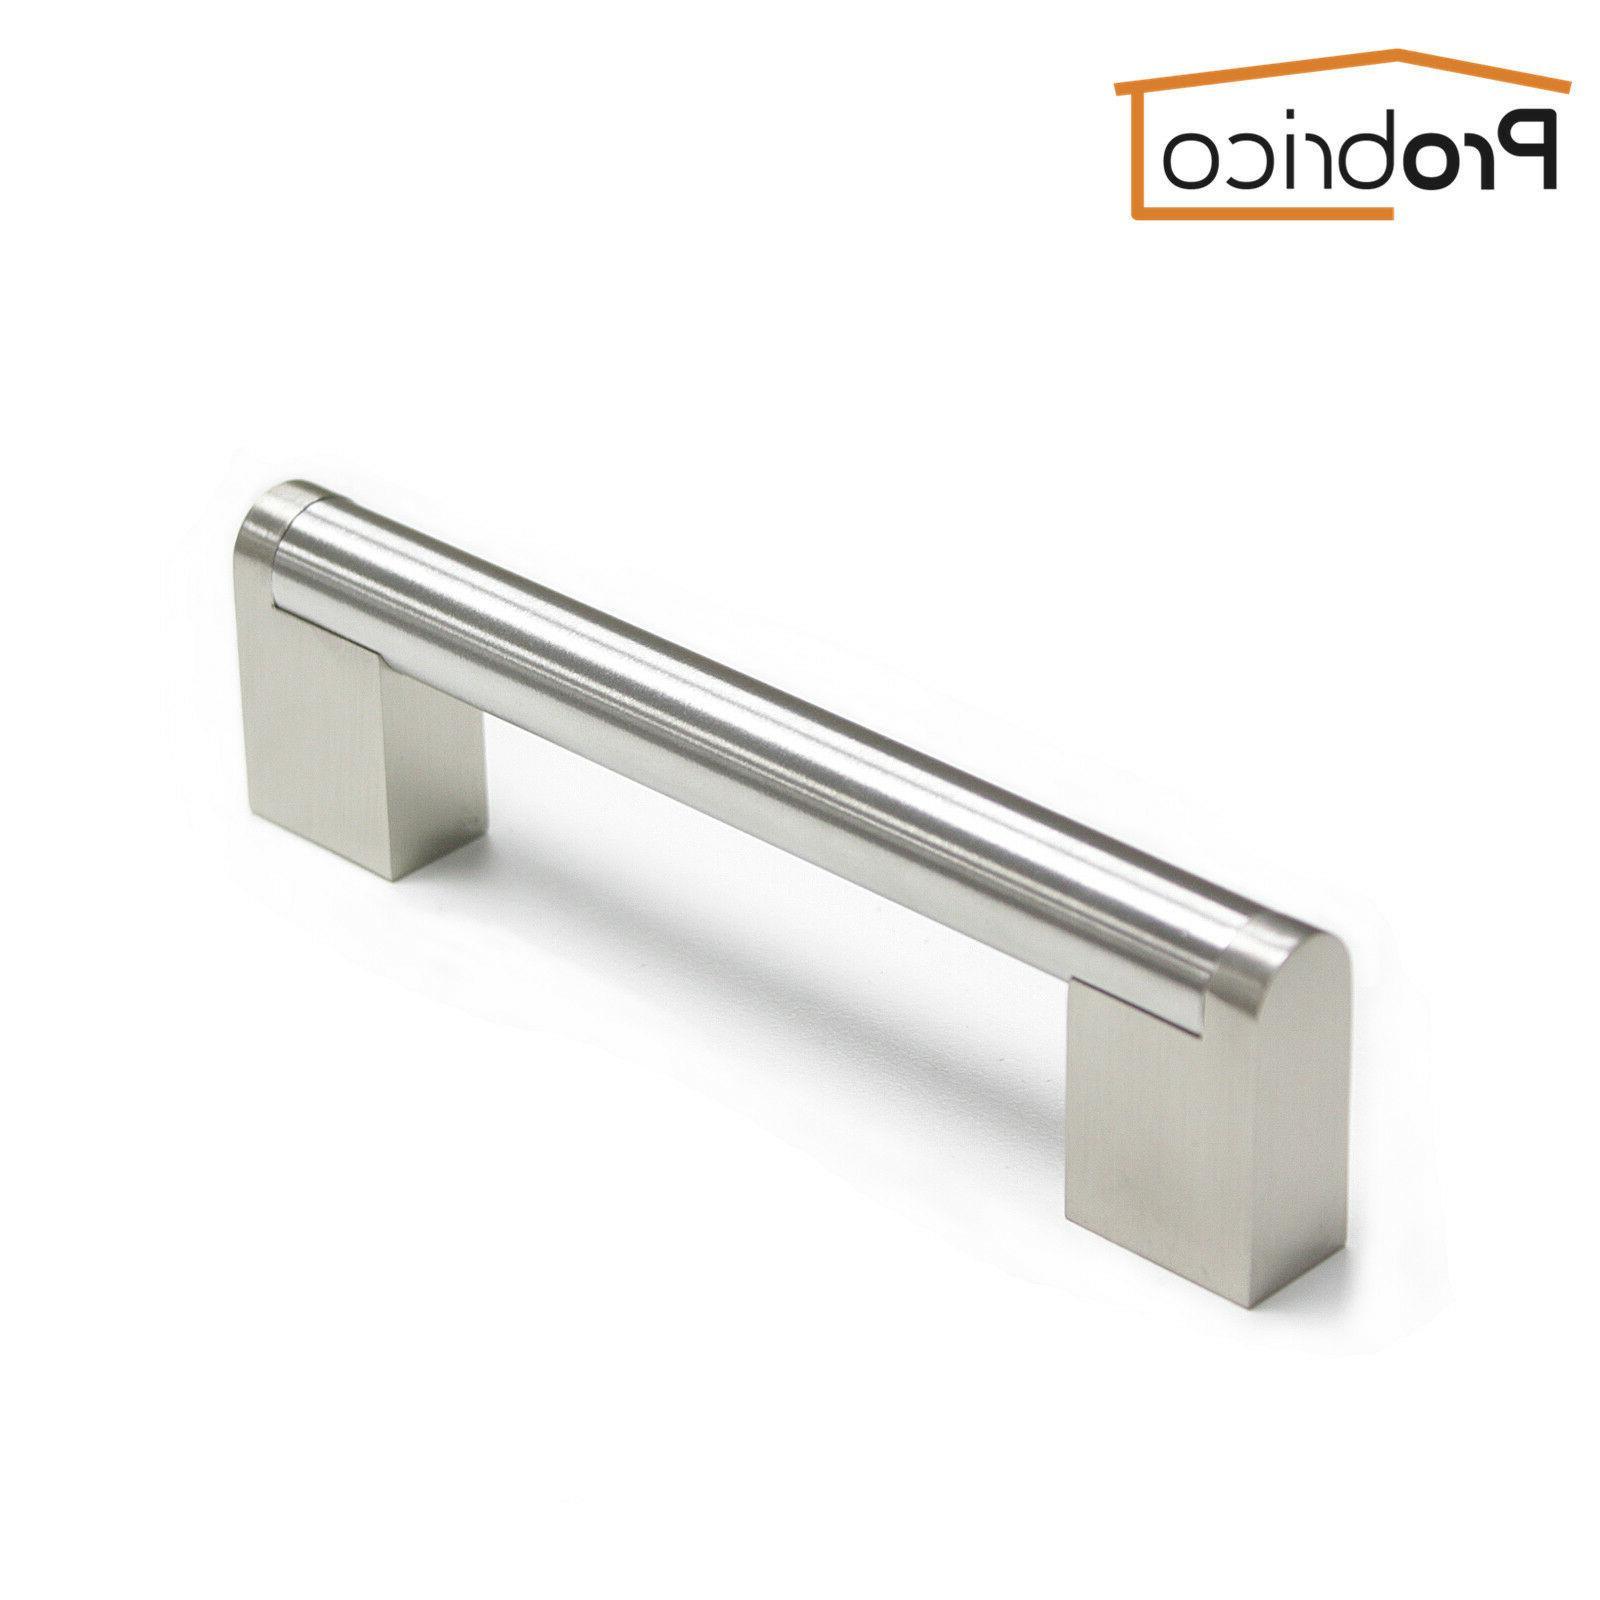 10PCS Nickel Cabinet Pulls Steel Boss Bar